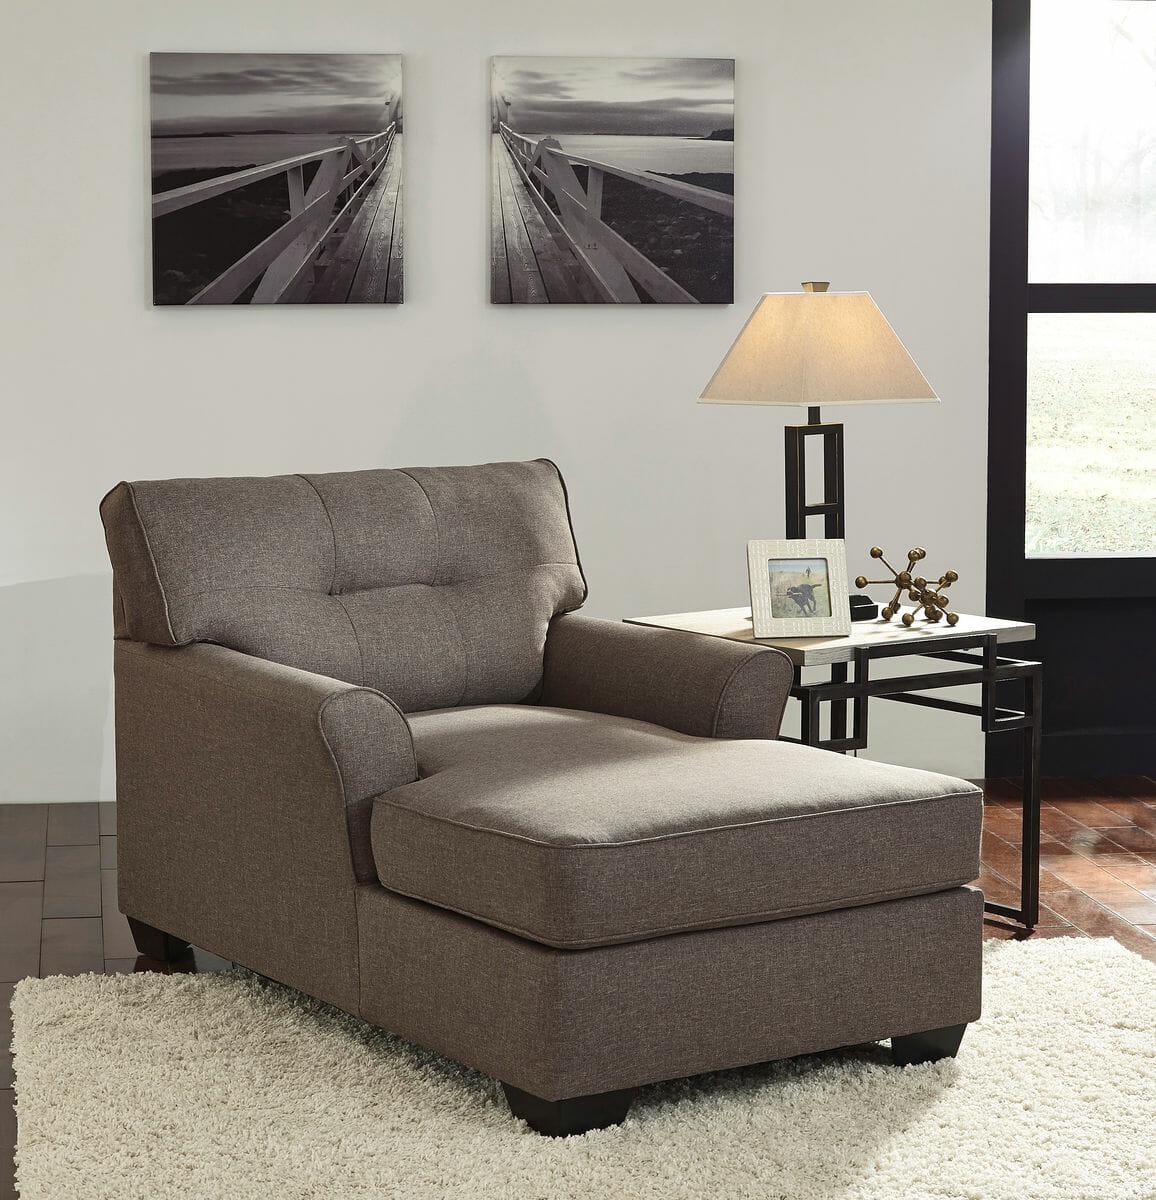 Tibbee Sofa Loveseat Amp Chaise Nc Gallery Furniture